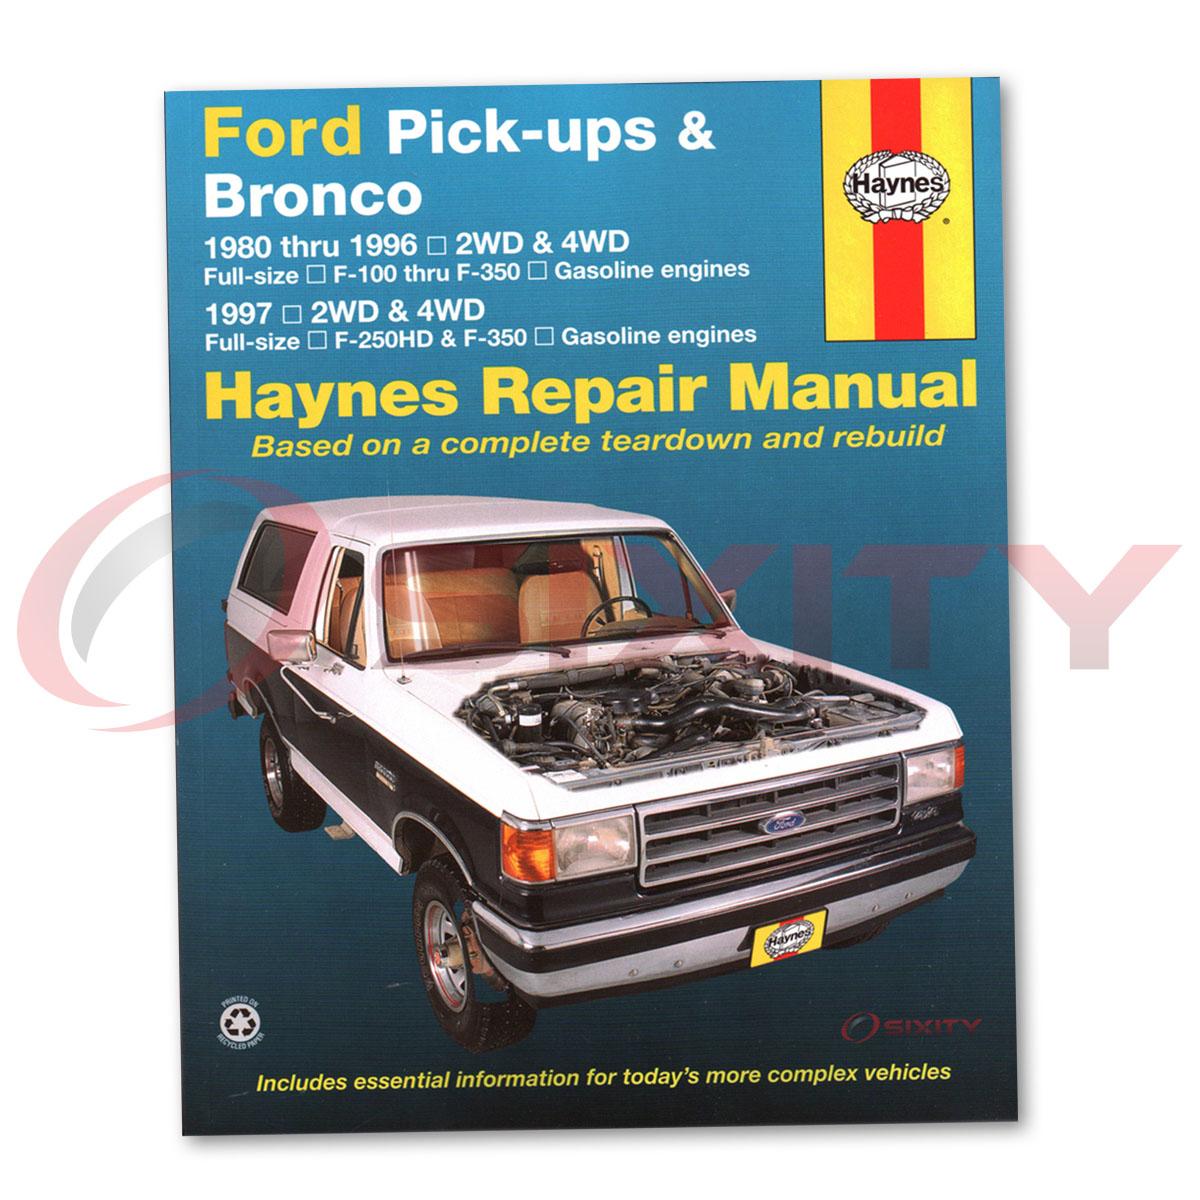 Encontr manual september 2016 ford f 250 haynes repair manual custom base special eddie bauer xls fandeluxe Images